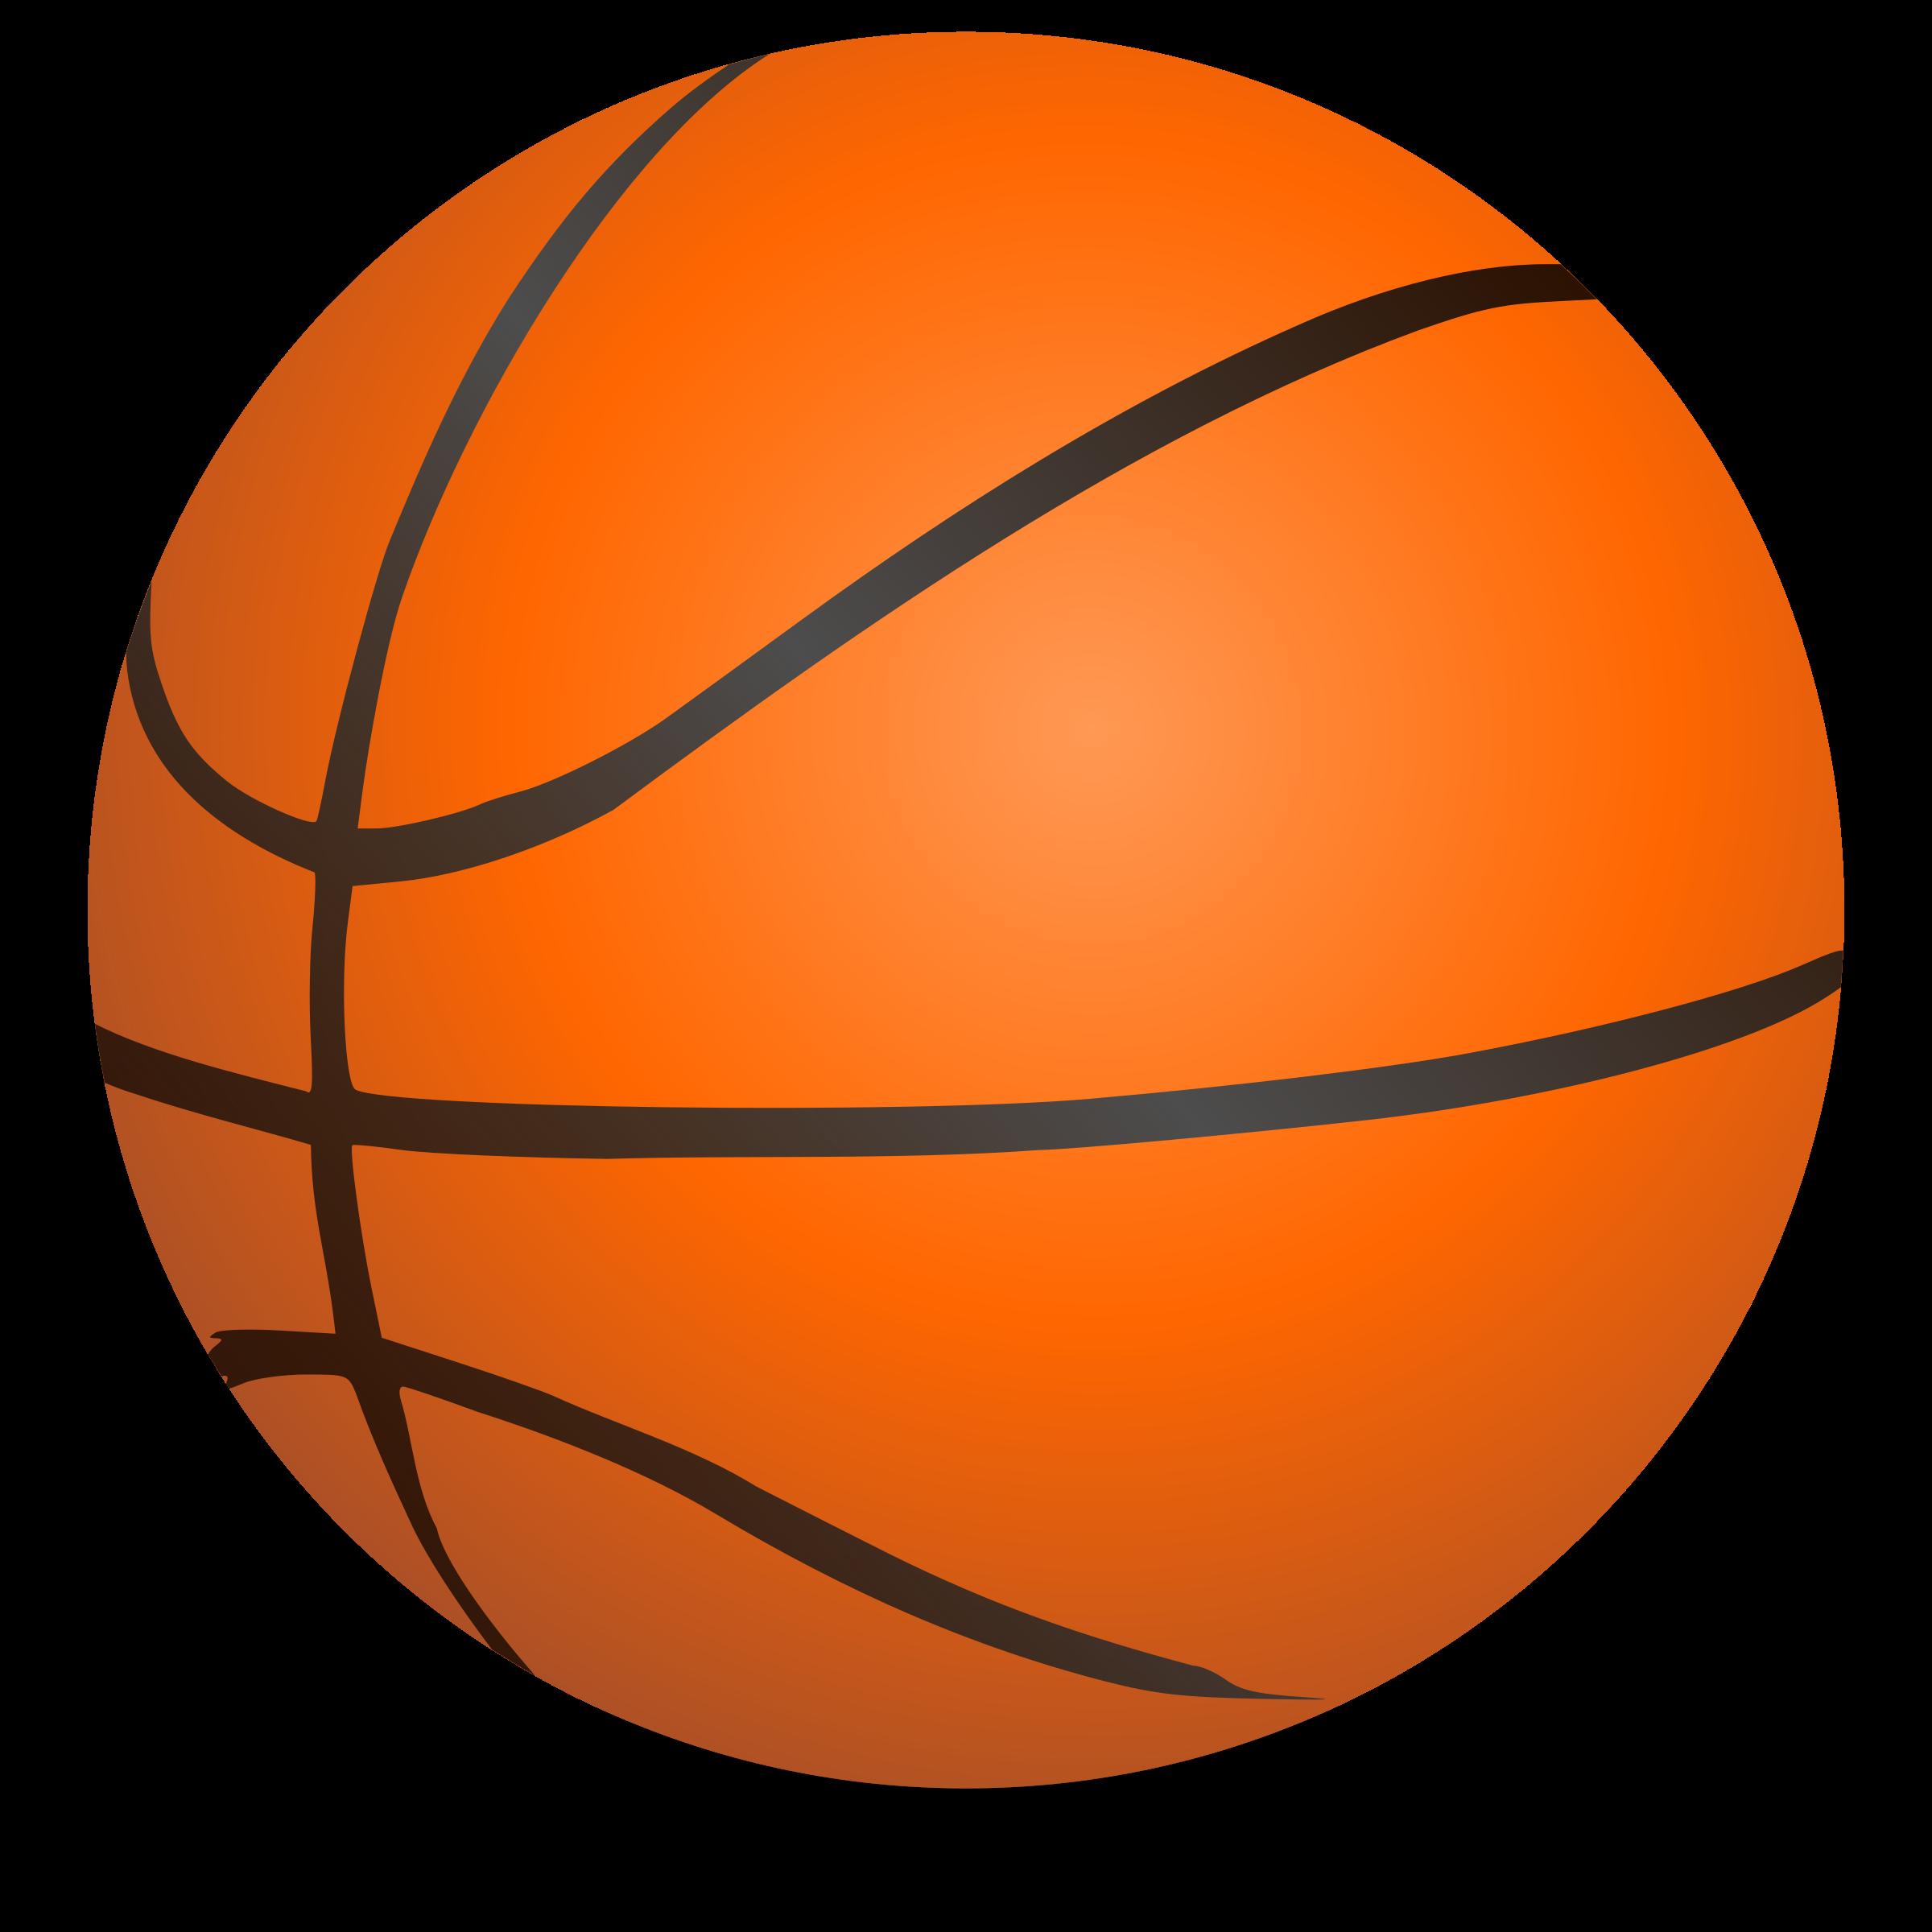 Design clipart basketball.